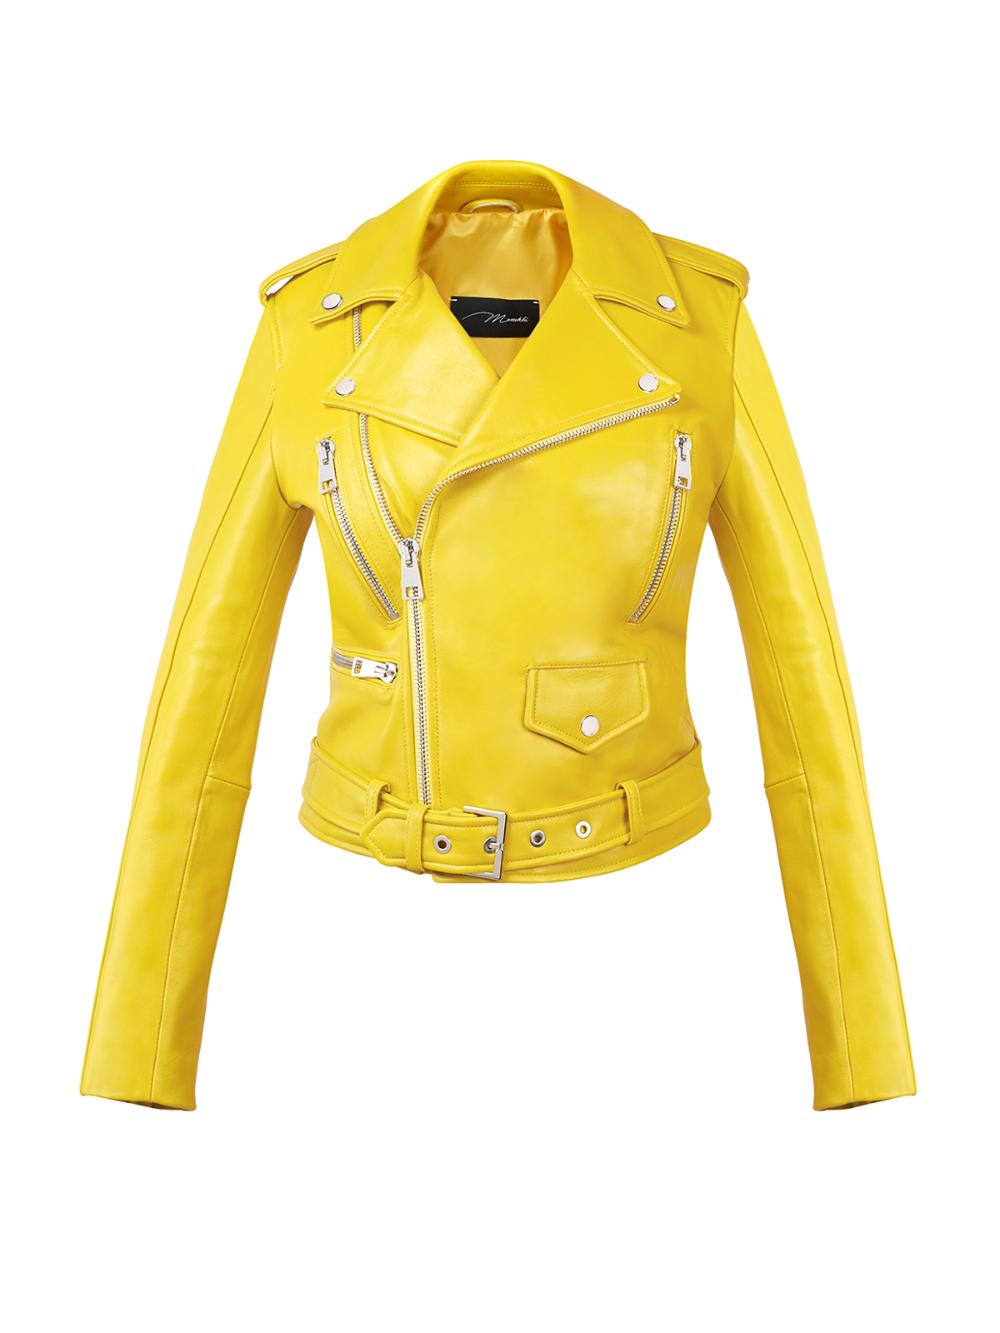 Classic Biker Jacket Jackets By Www Manokhi Com Best Leather Jackets Leather Jacket Leather Bustier [ 1333 x 1000 Pixel ]